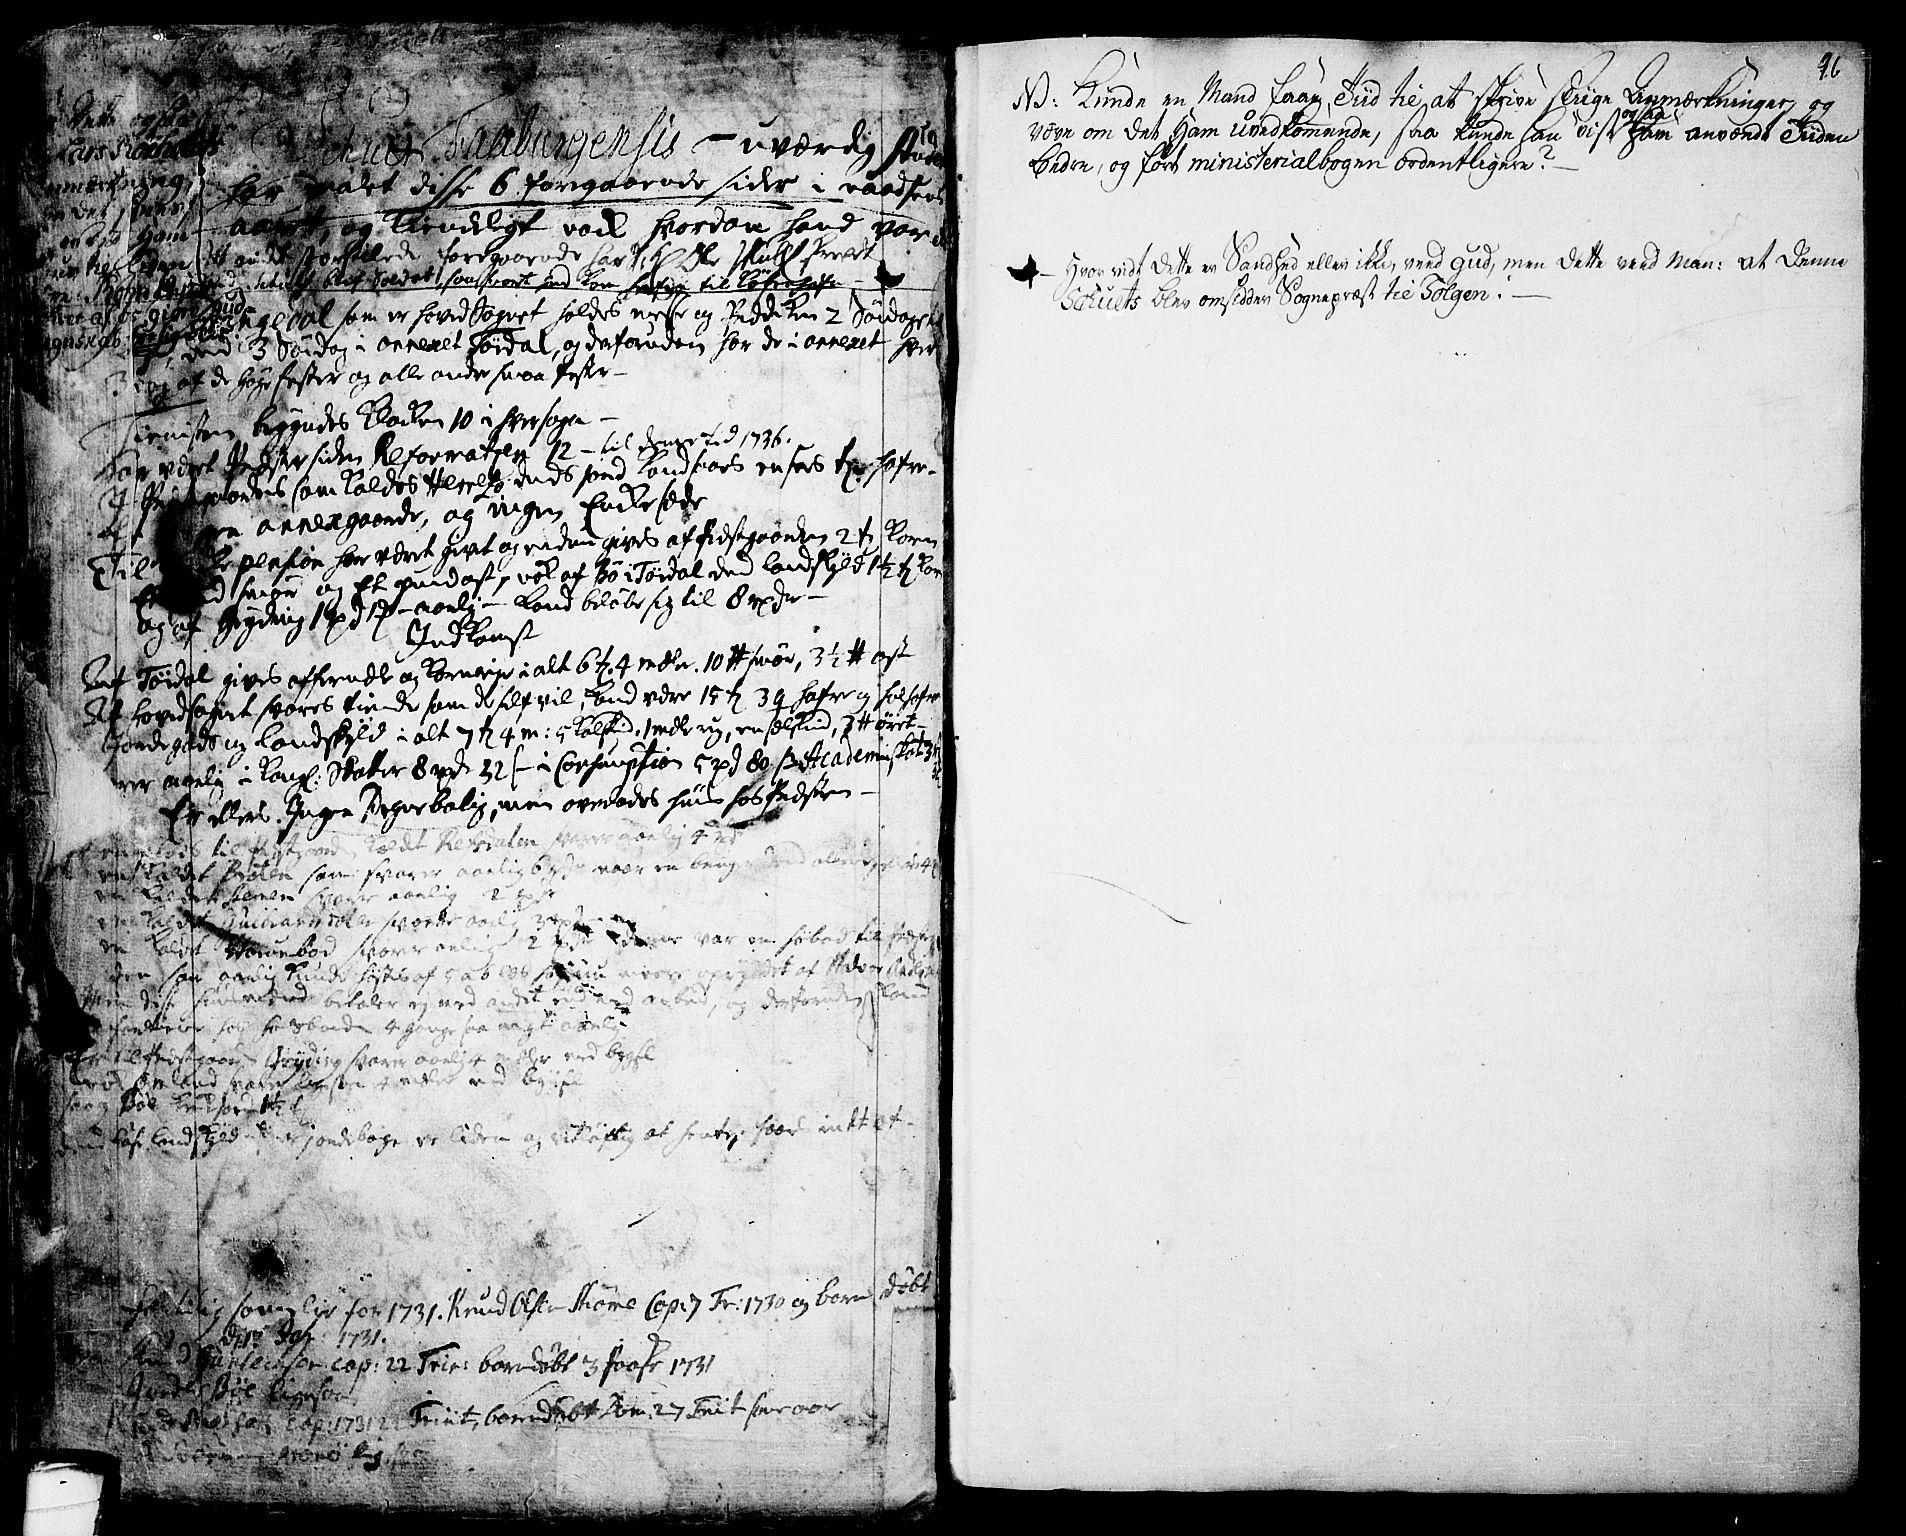 SAKO, Drangedal kirkebøker, F/Fa/L0001: Ministerialbok nr. 1, 1697-1767, s. 96